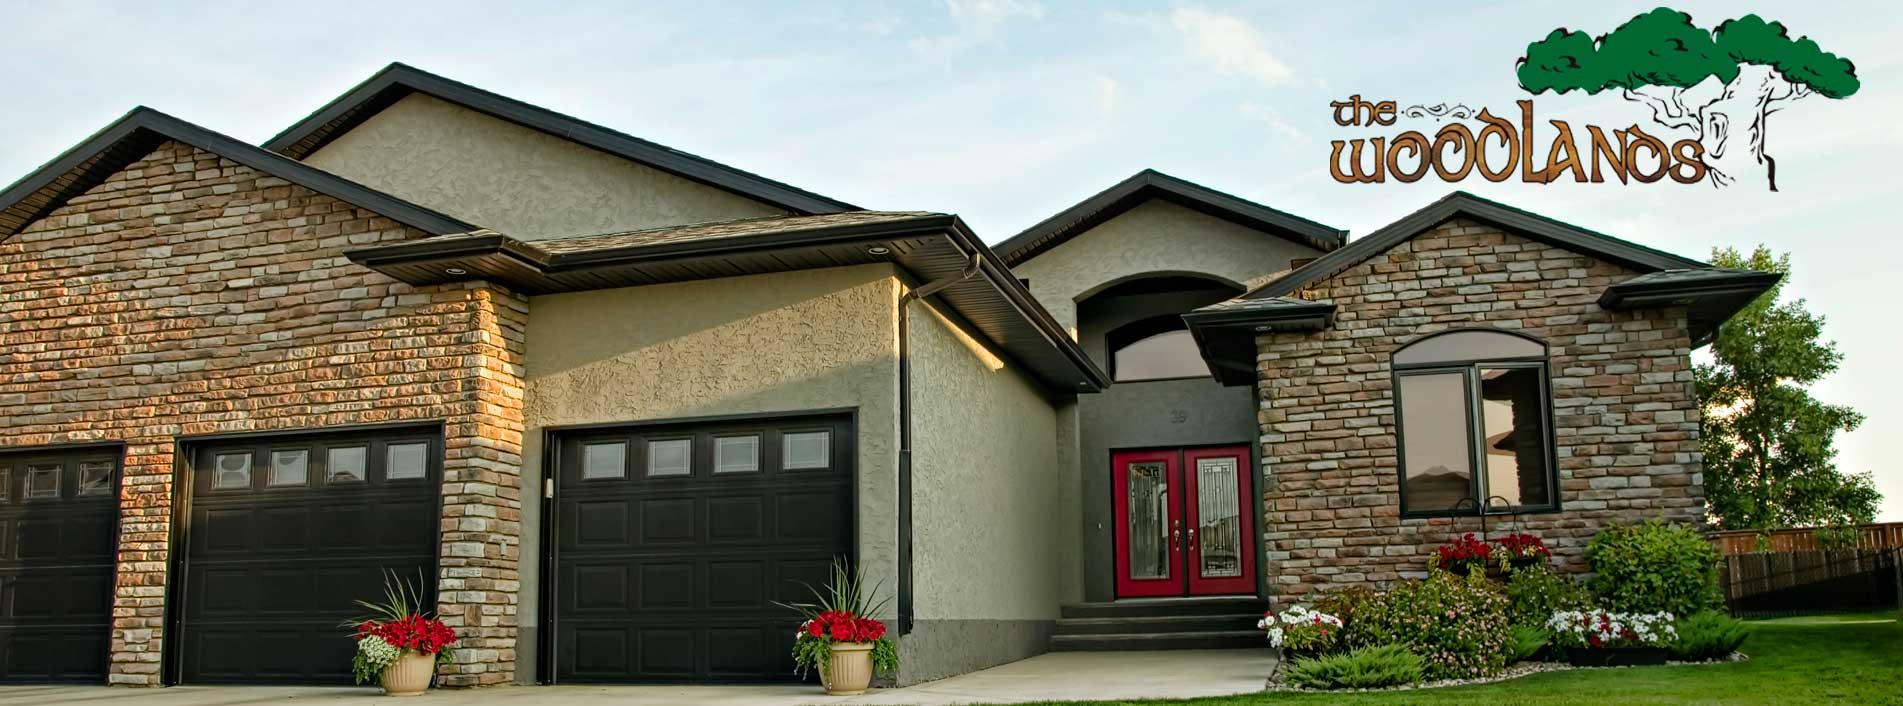 Woodlands Header, Southridge Estates, VBJ Developments, Brandon, J&G Homes